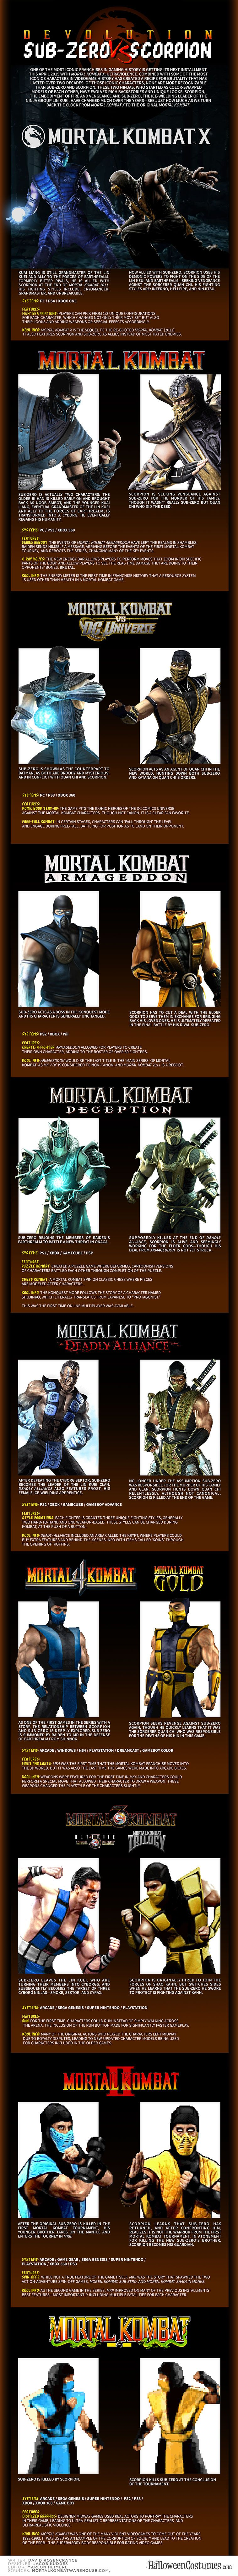 Mortal-Kombat-SubZero-Scorpion-Infographie-evolution [758 x 8197]